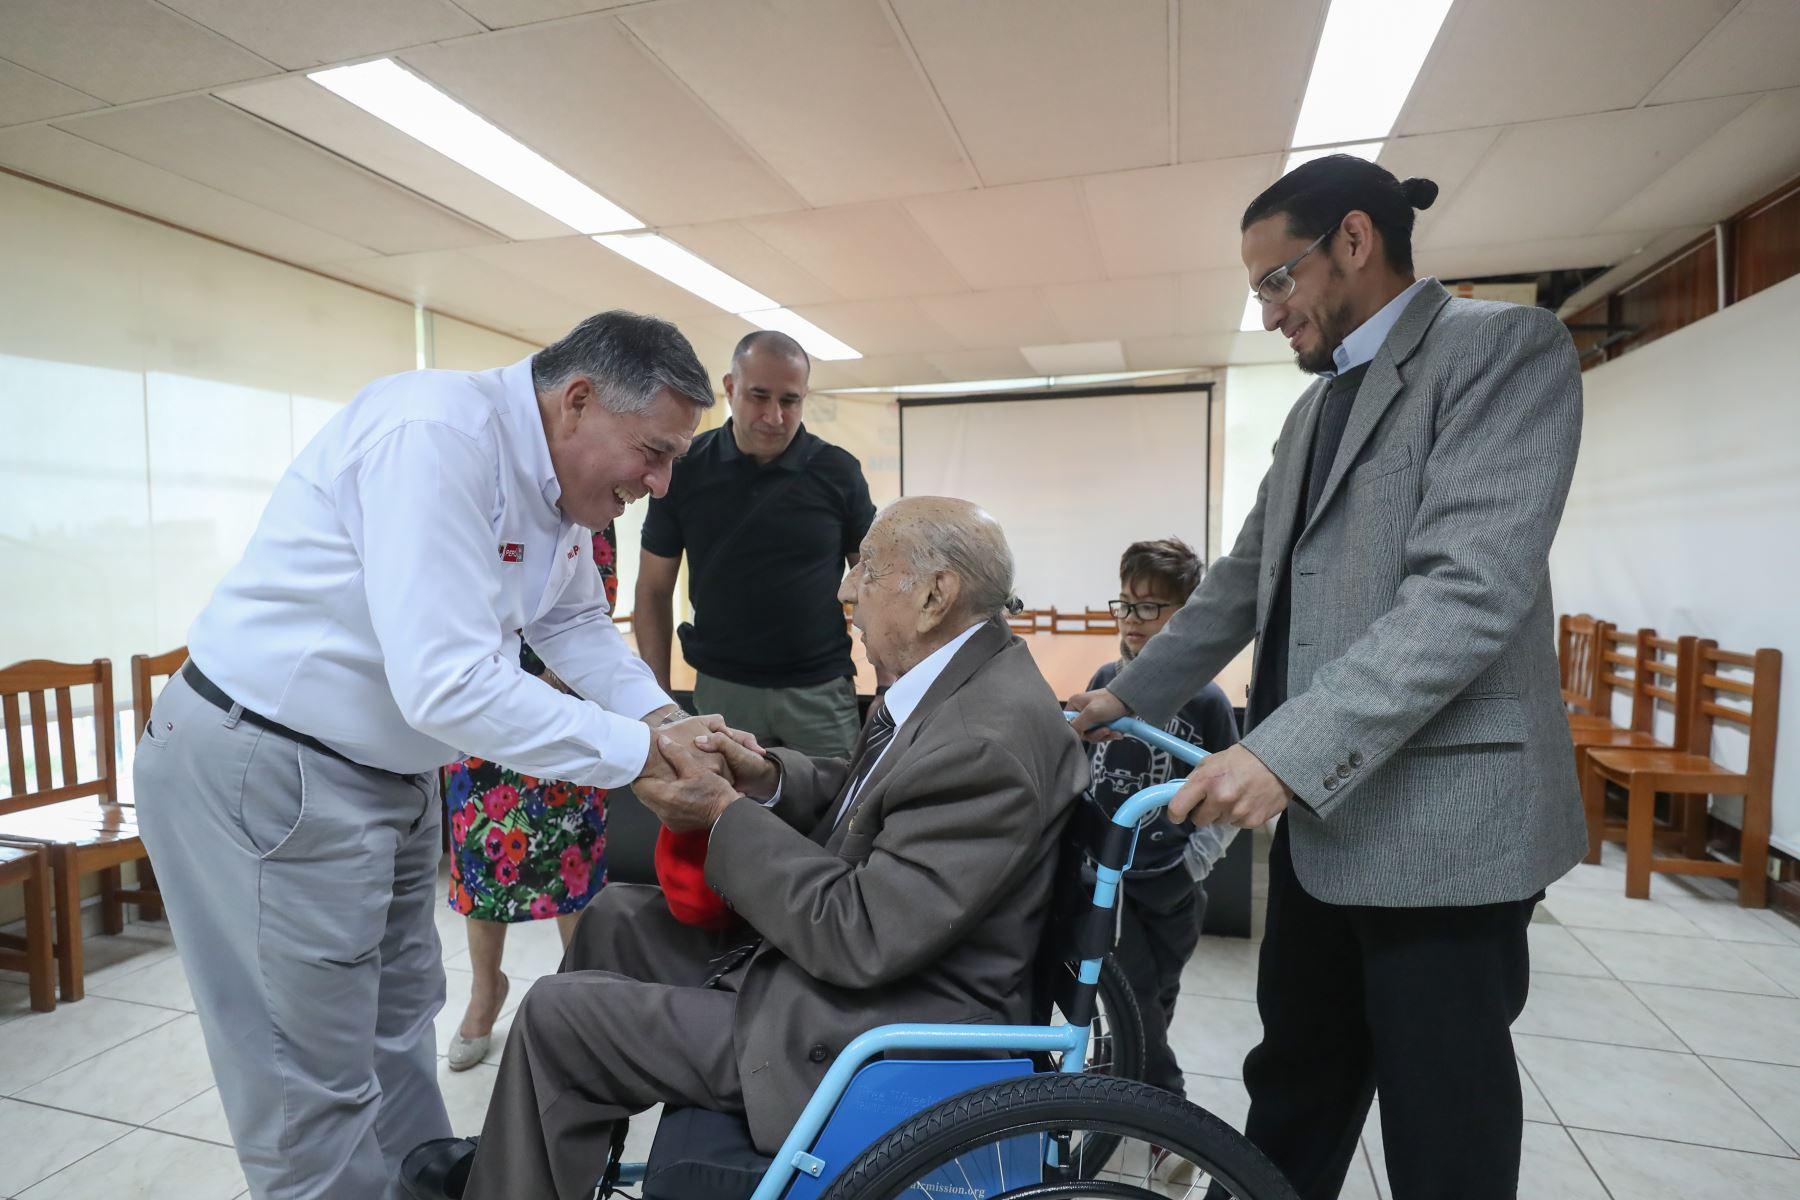 Ministro de Defensa, Jorge Moscoso saluda a Jorge Sanjinez, veterano peruano de la Segunda Guerra Mundial. Foto: MINDEF